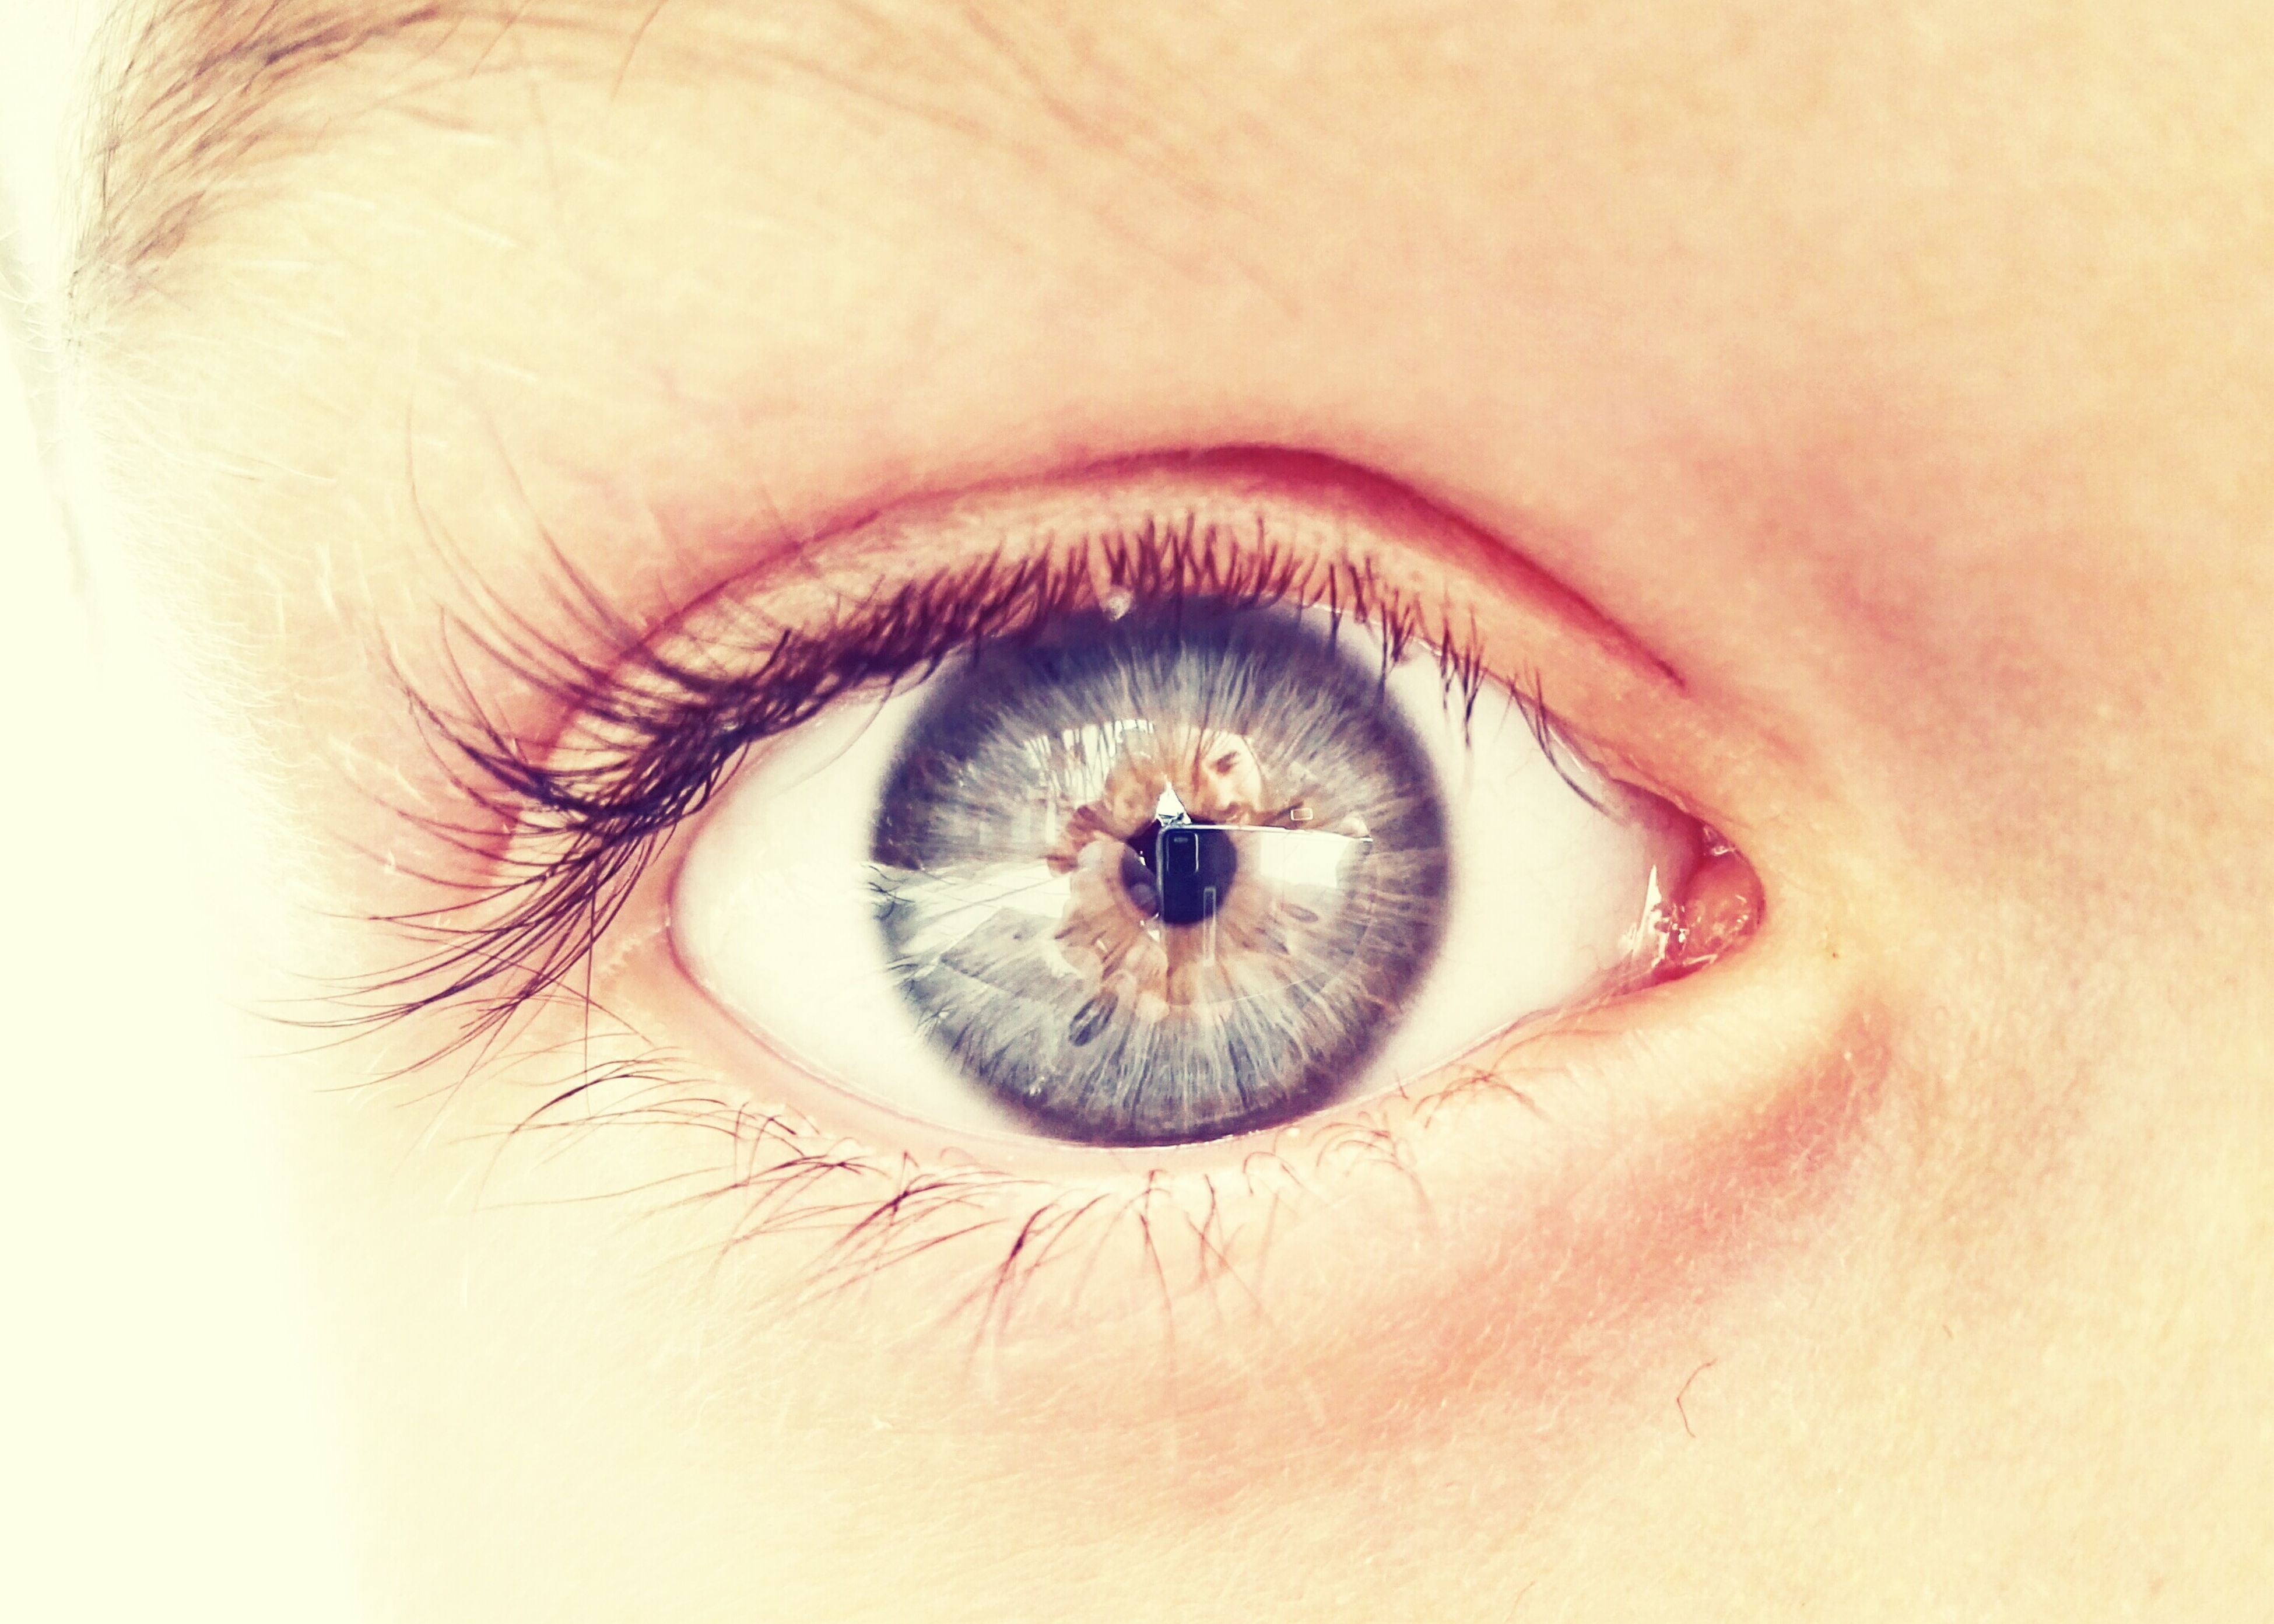 human eye, eyelash, eyesight, sensory perception, close-up, iris - eye, extreme close-up, looking at camera, portrait, part of, eyeball, human skin, vision, eyebrow, full frame, unrecognizable person, extreme close up